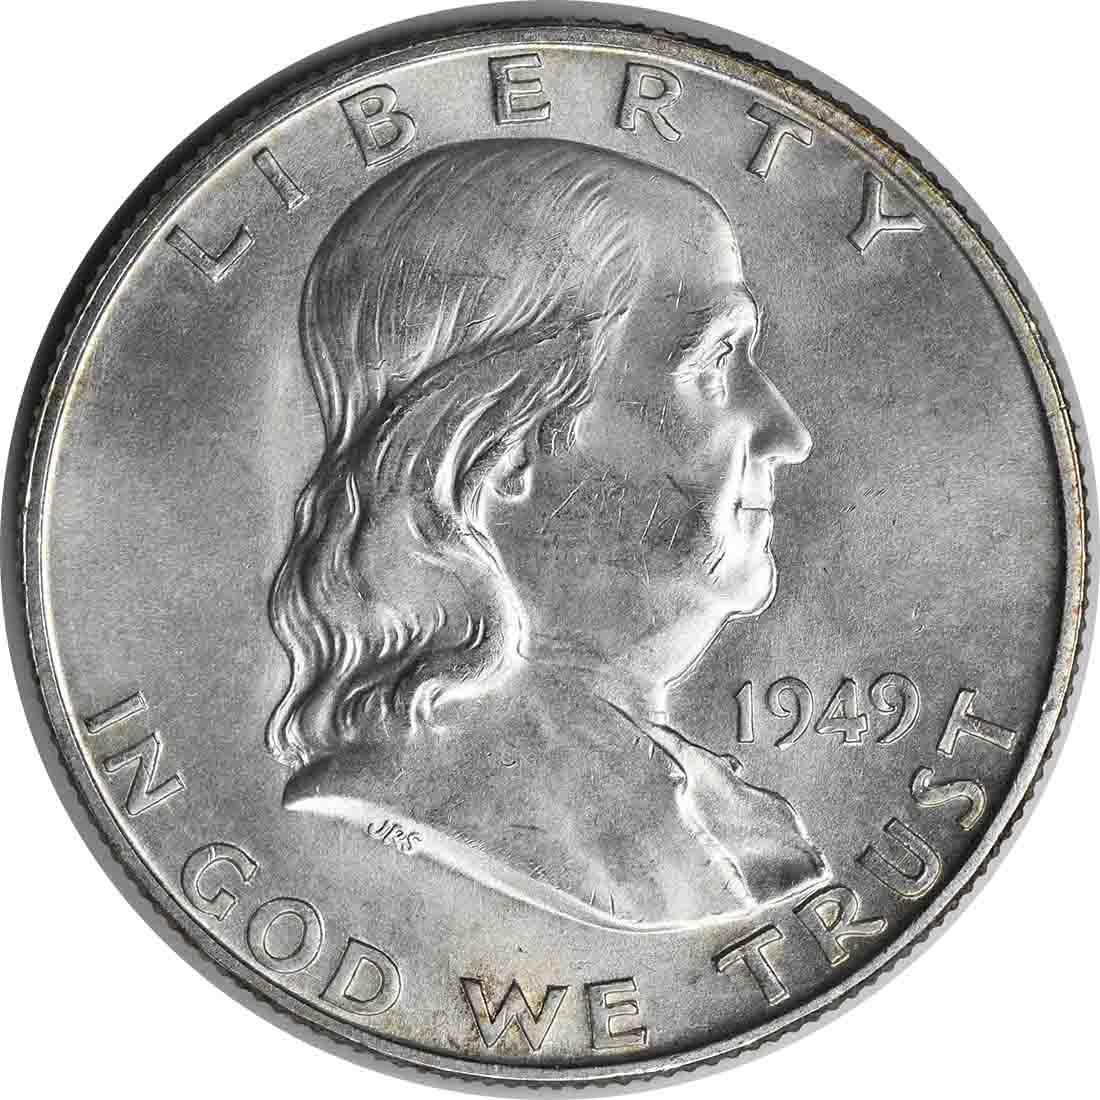 1949-D Franklin Silver Half Dollar MS64 Uncertified